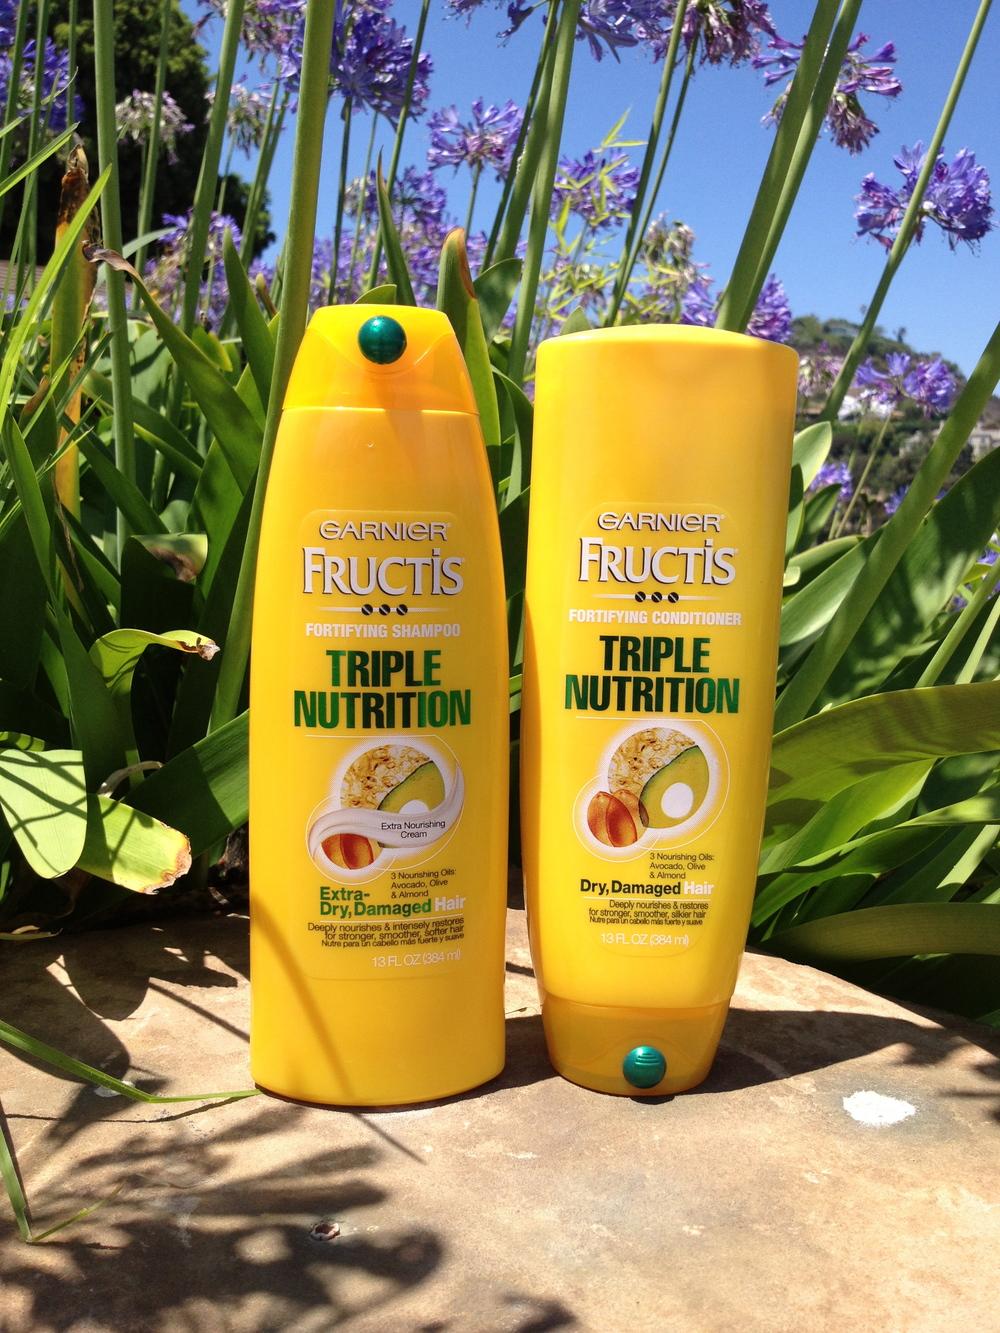 Garnier Fructis Triple Nutrition Shampoo, $2.25 Garnier Fructis Triple Nutrition Conditioner, $3.00